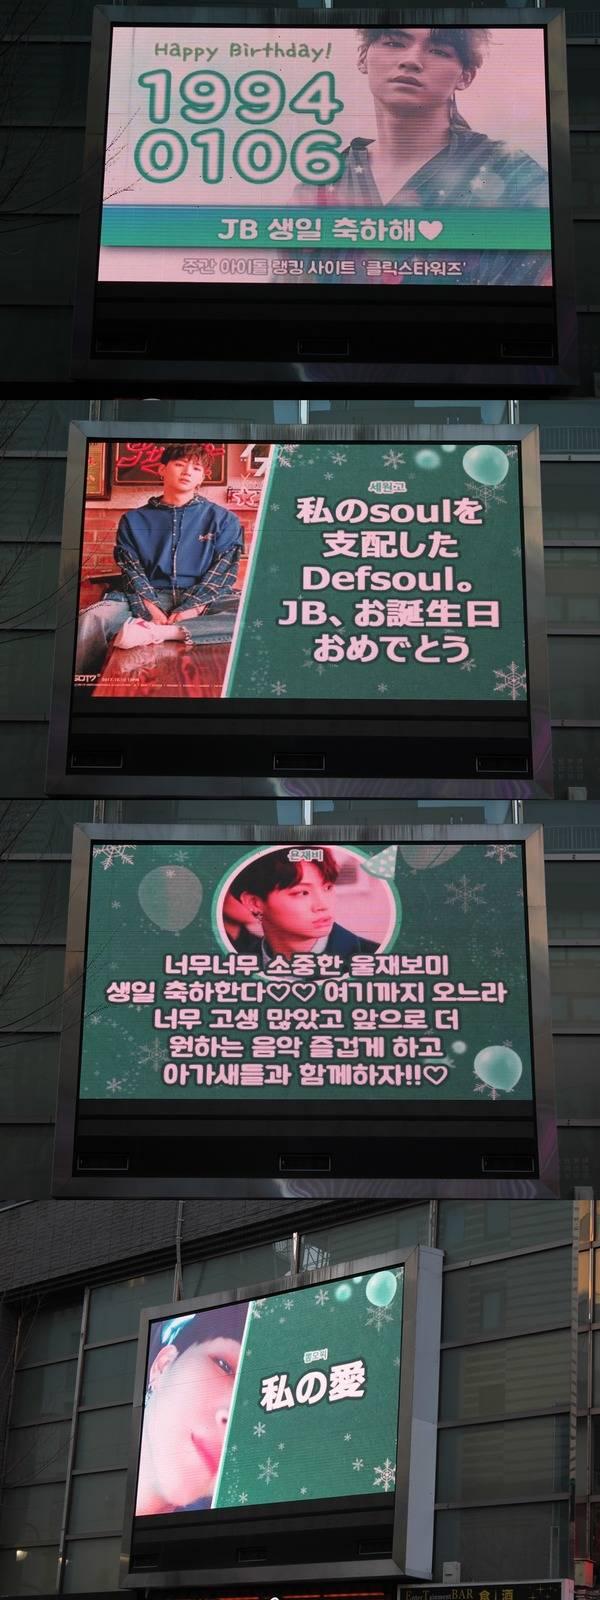 東京・新大久保電光掲示板で祝福動画を上映。|写真:Click! StarWars